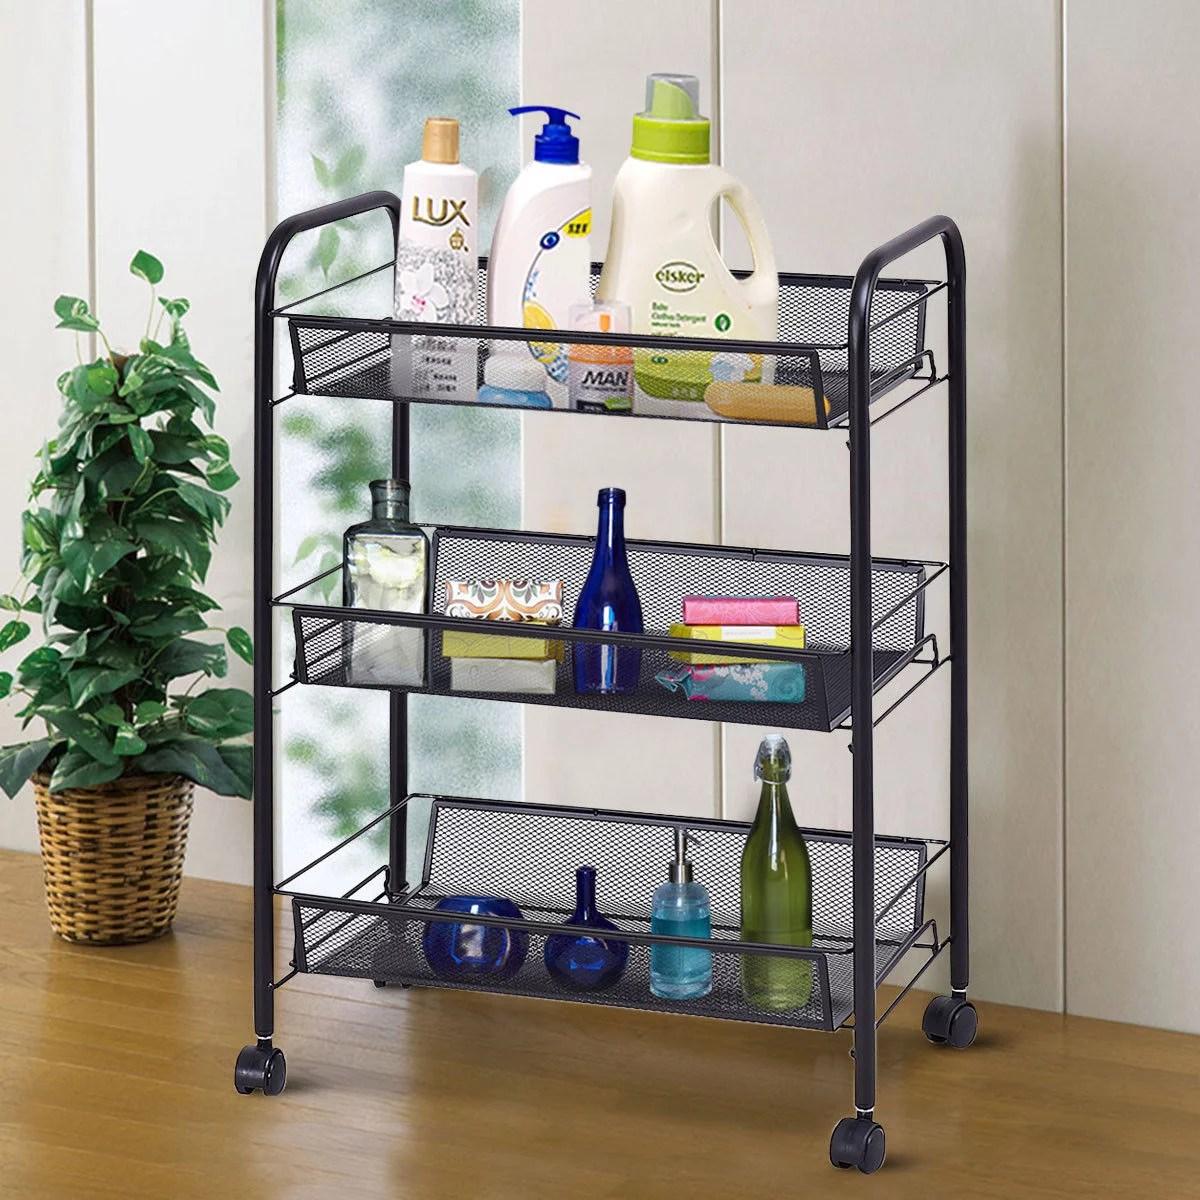 kitchen organizer counter rack 3 tier storage trolley cart home utility qty